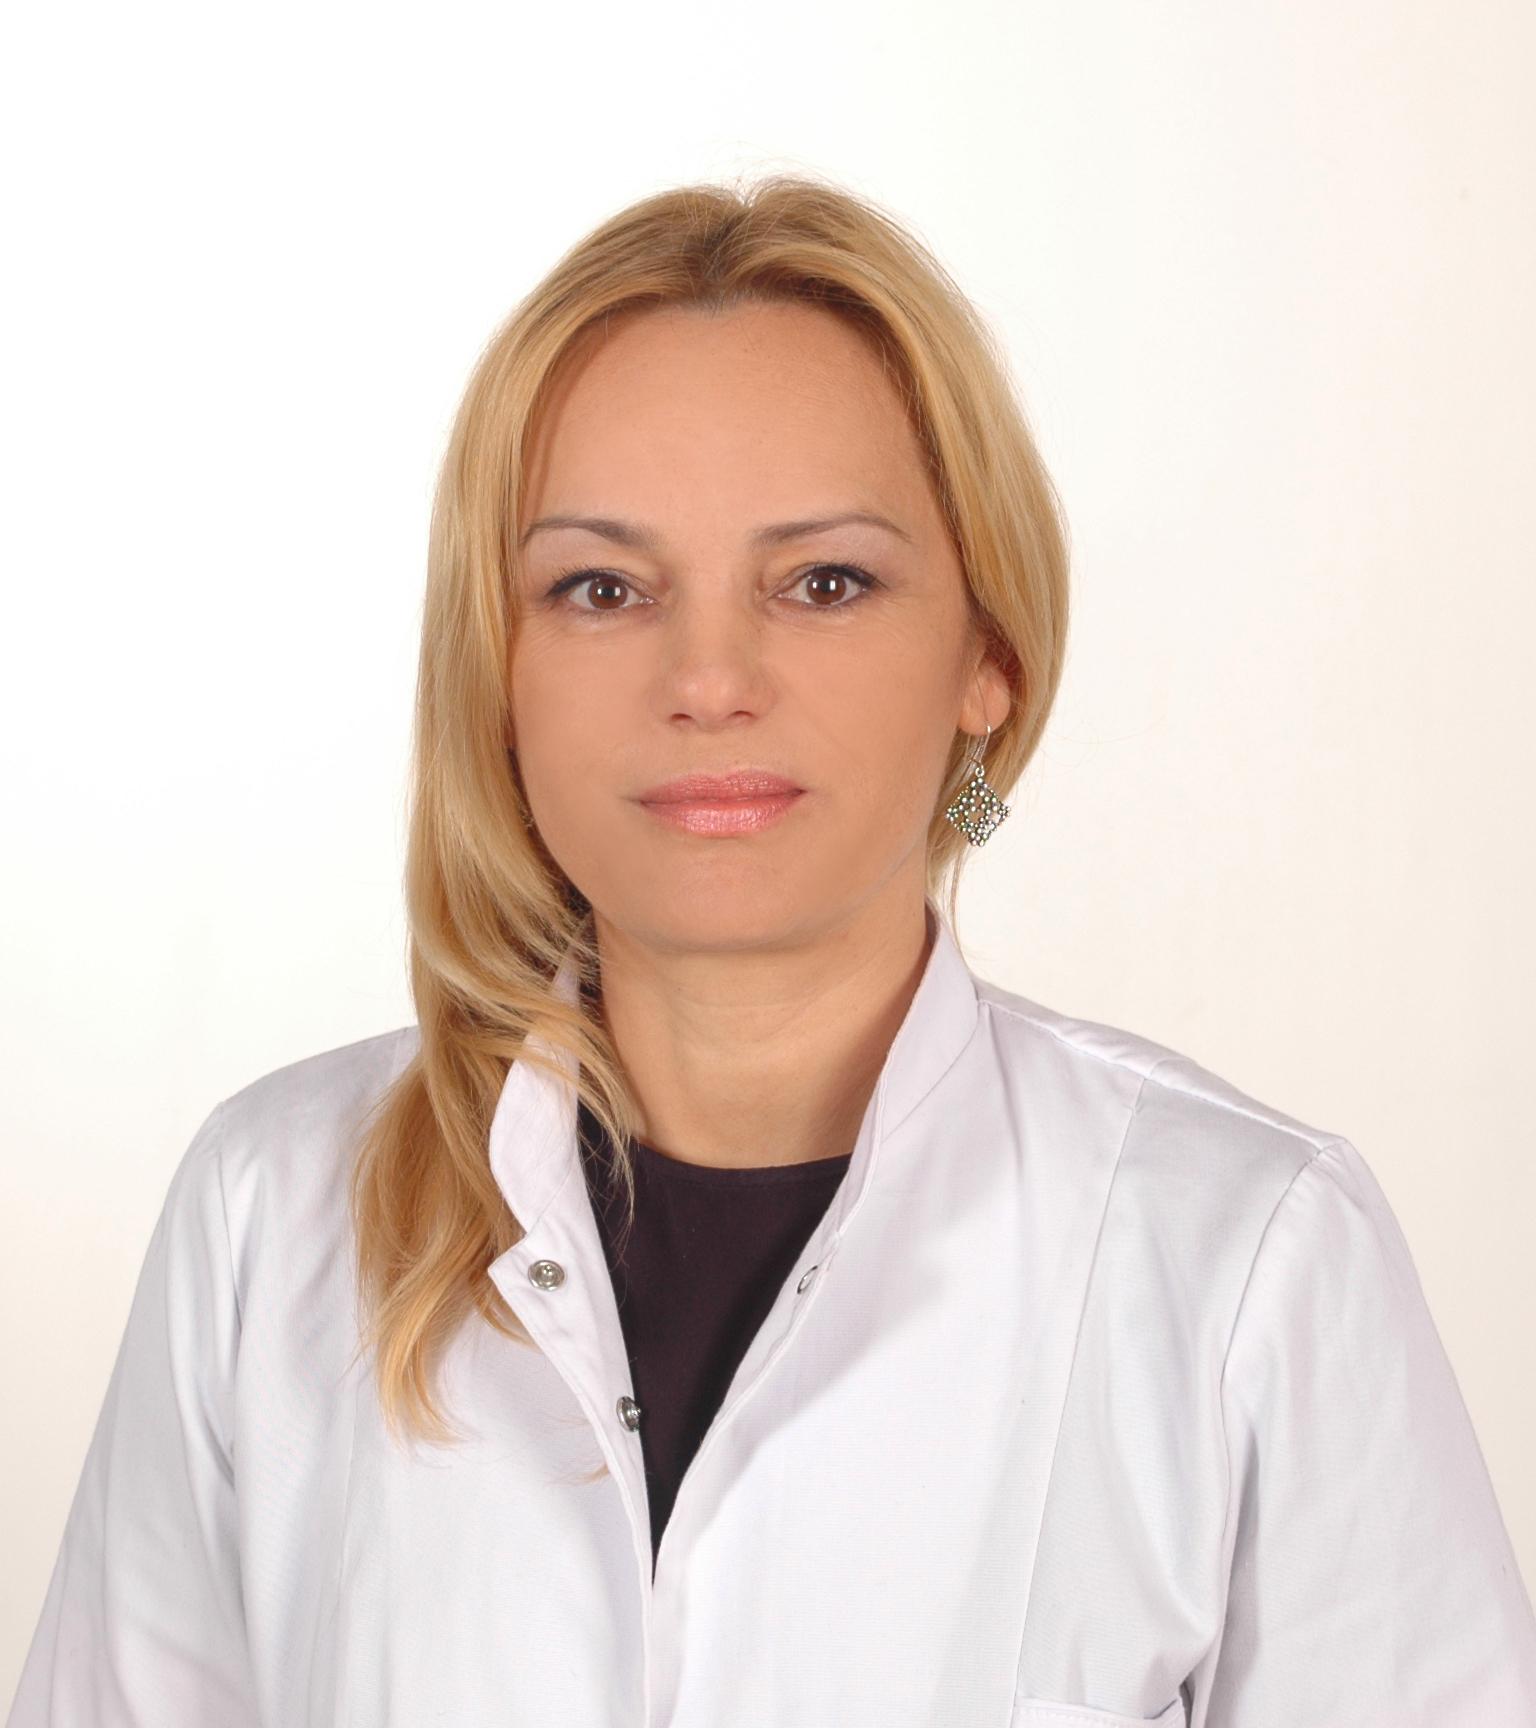 Zuzanna Potemska-Kuznik